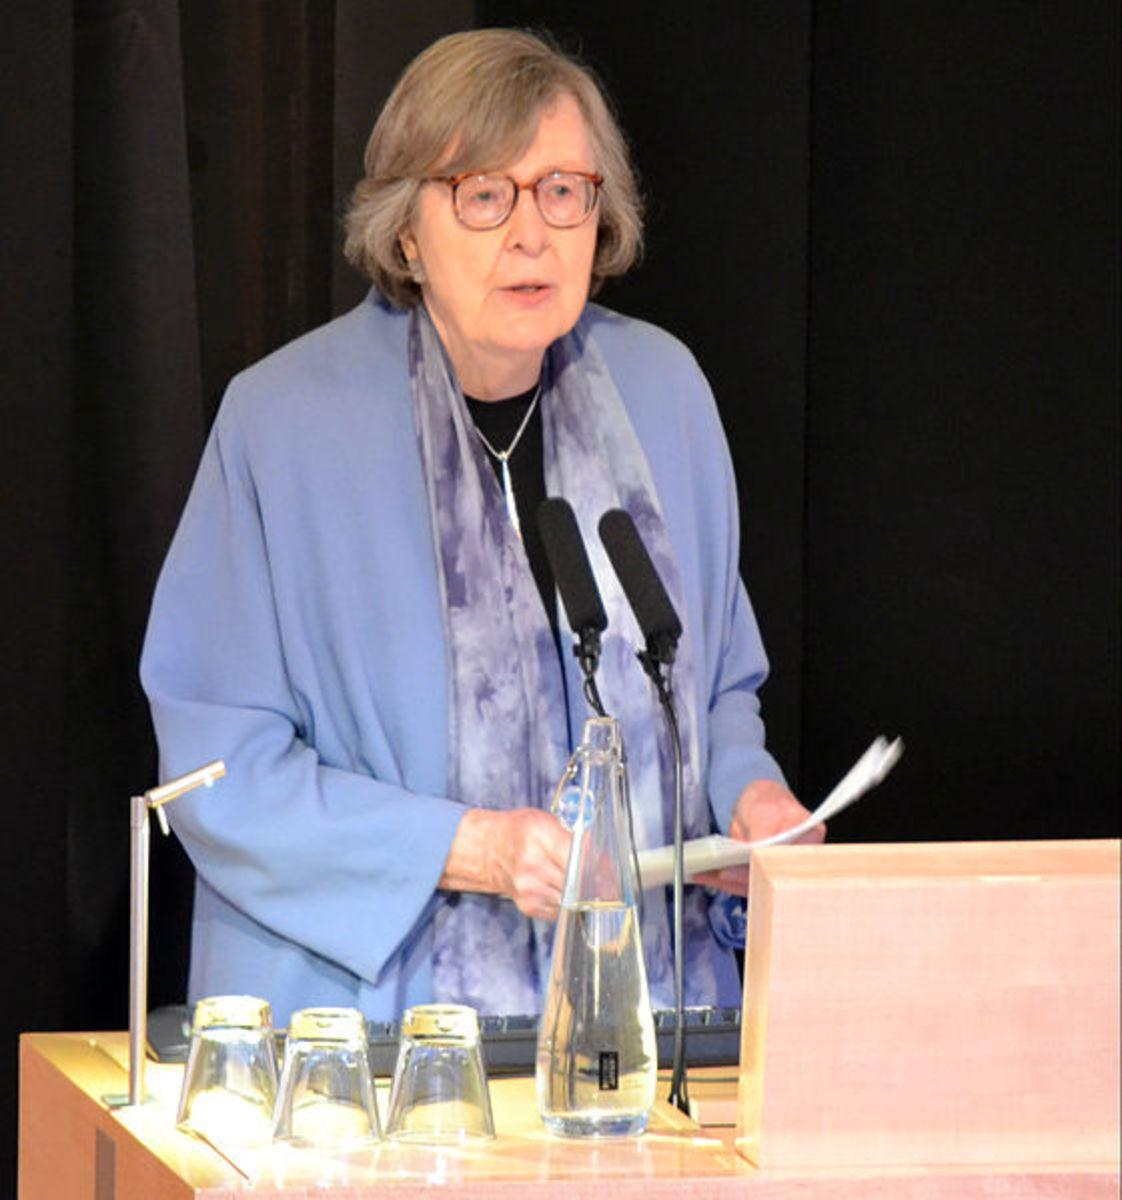 Penelope Lively, aged 80